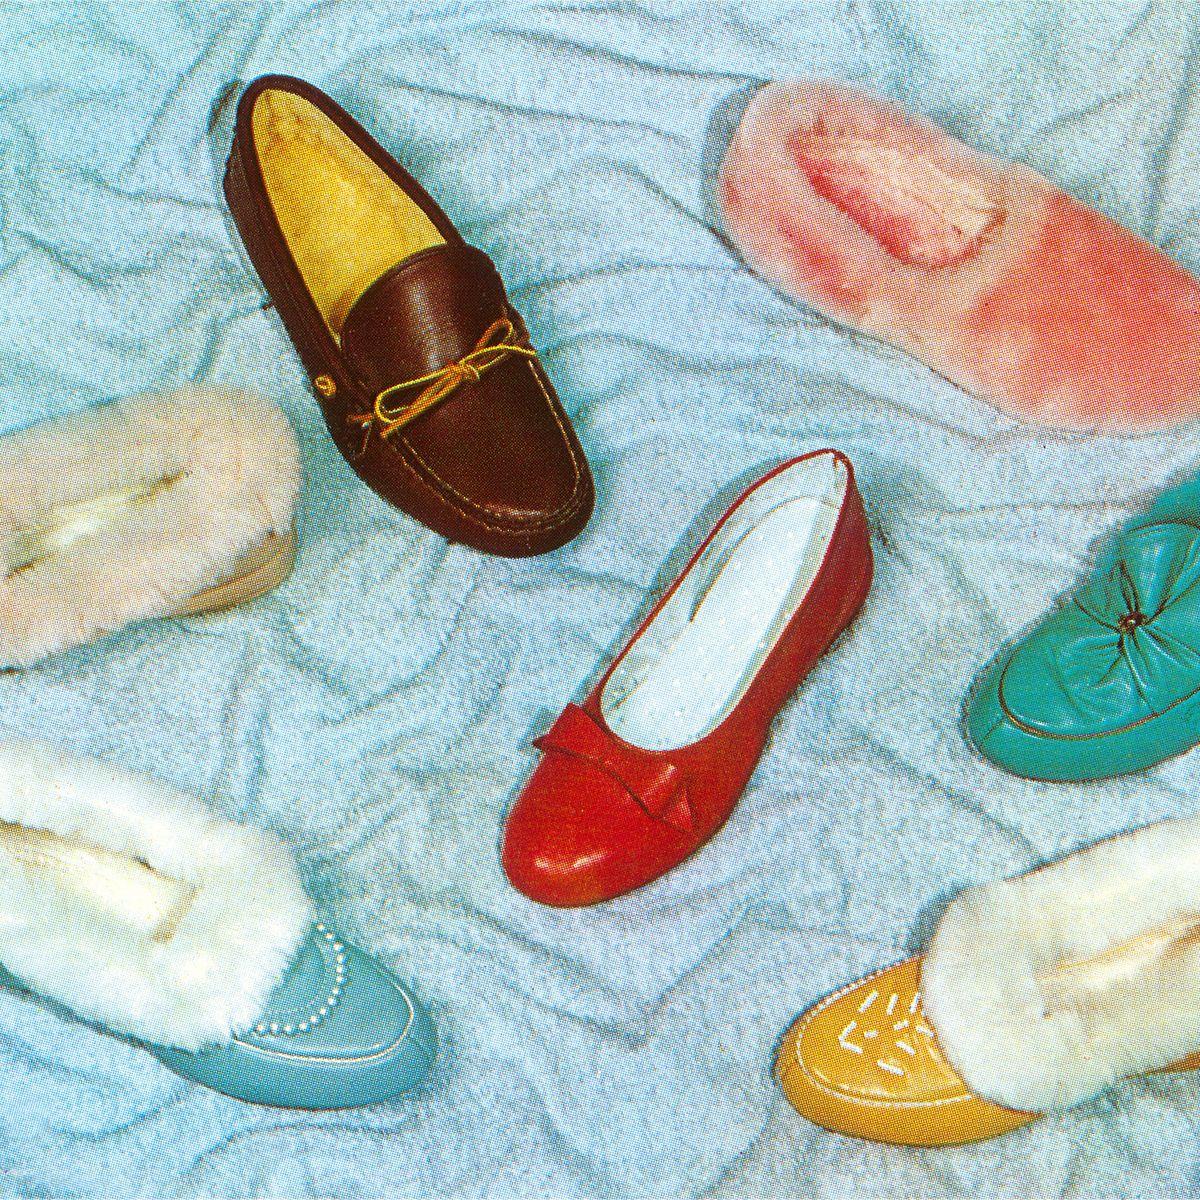 Womens Office Felt Peep Toe Shoes White Leather Flats